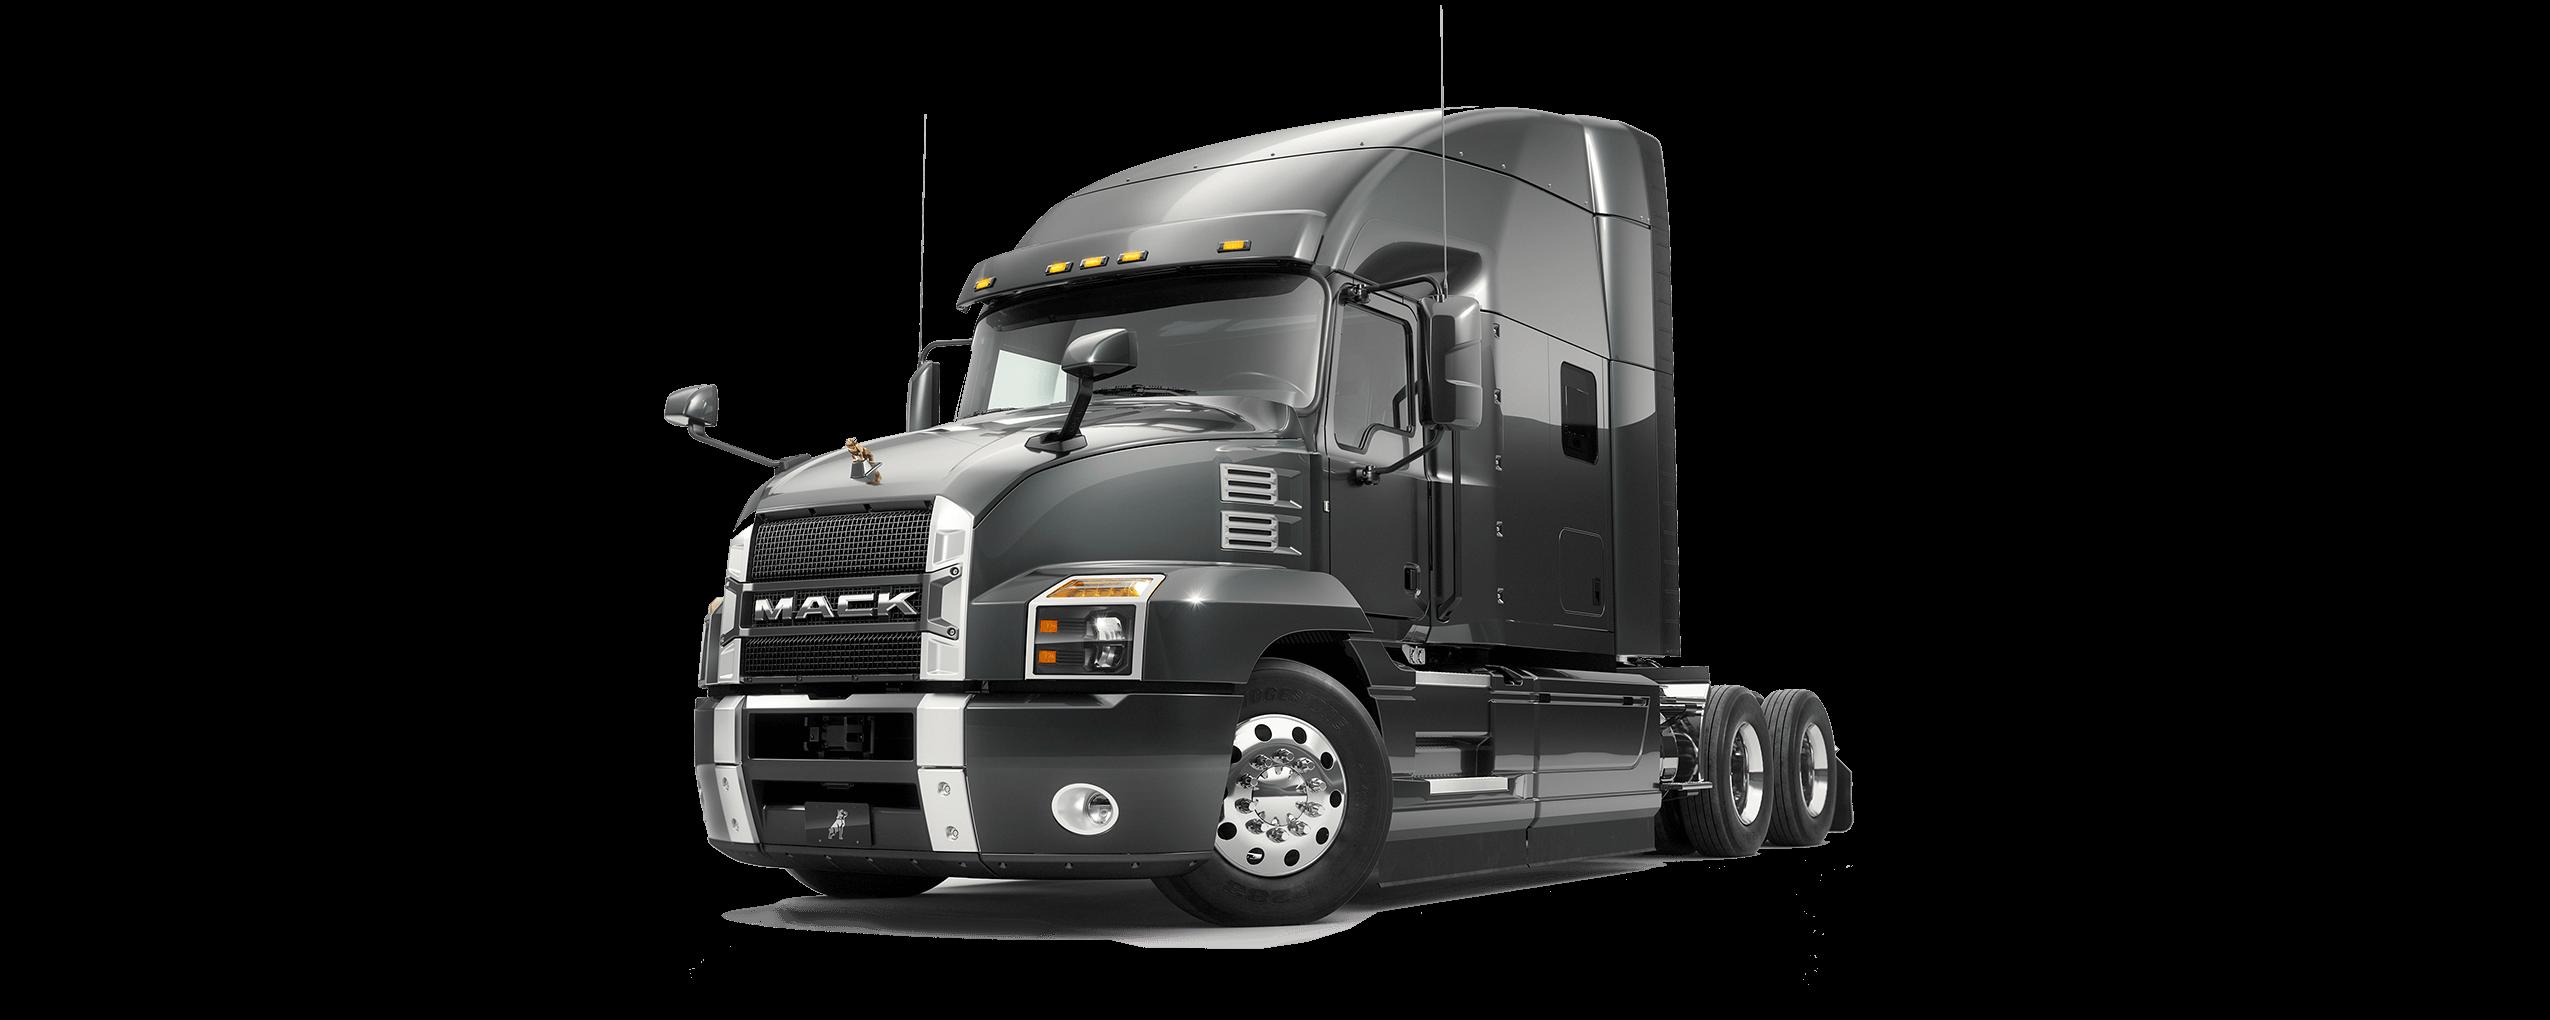 AUTO TRUCK - U.S.A. - MACK - ANTHEM - MACKTRUCKS.COM - 13 ...